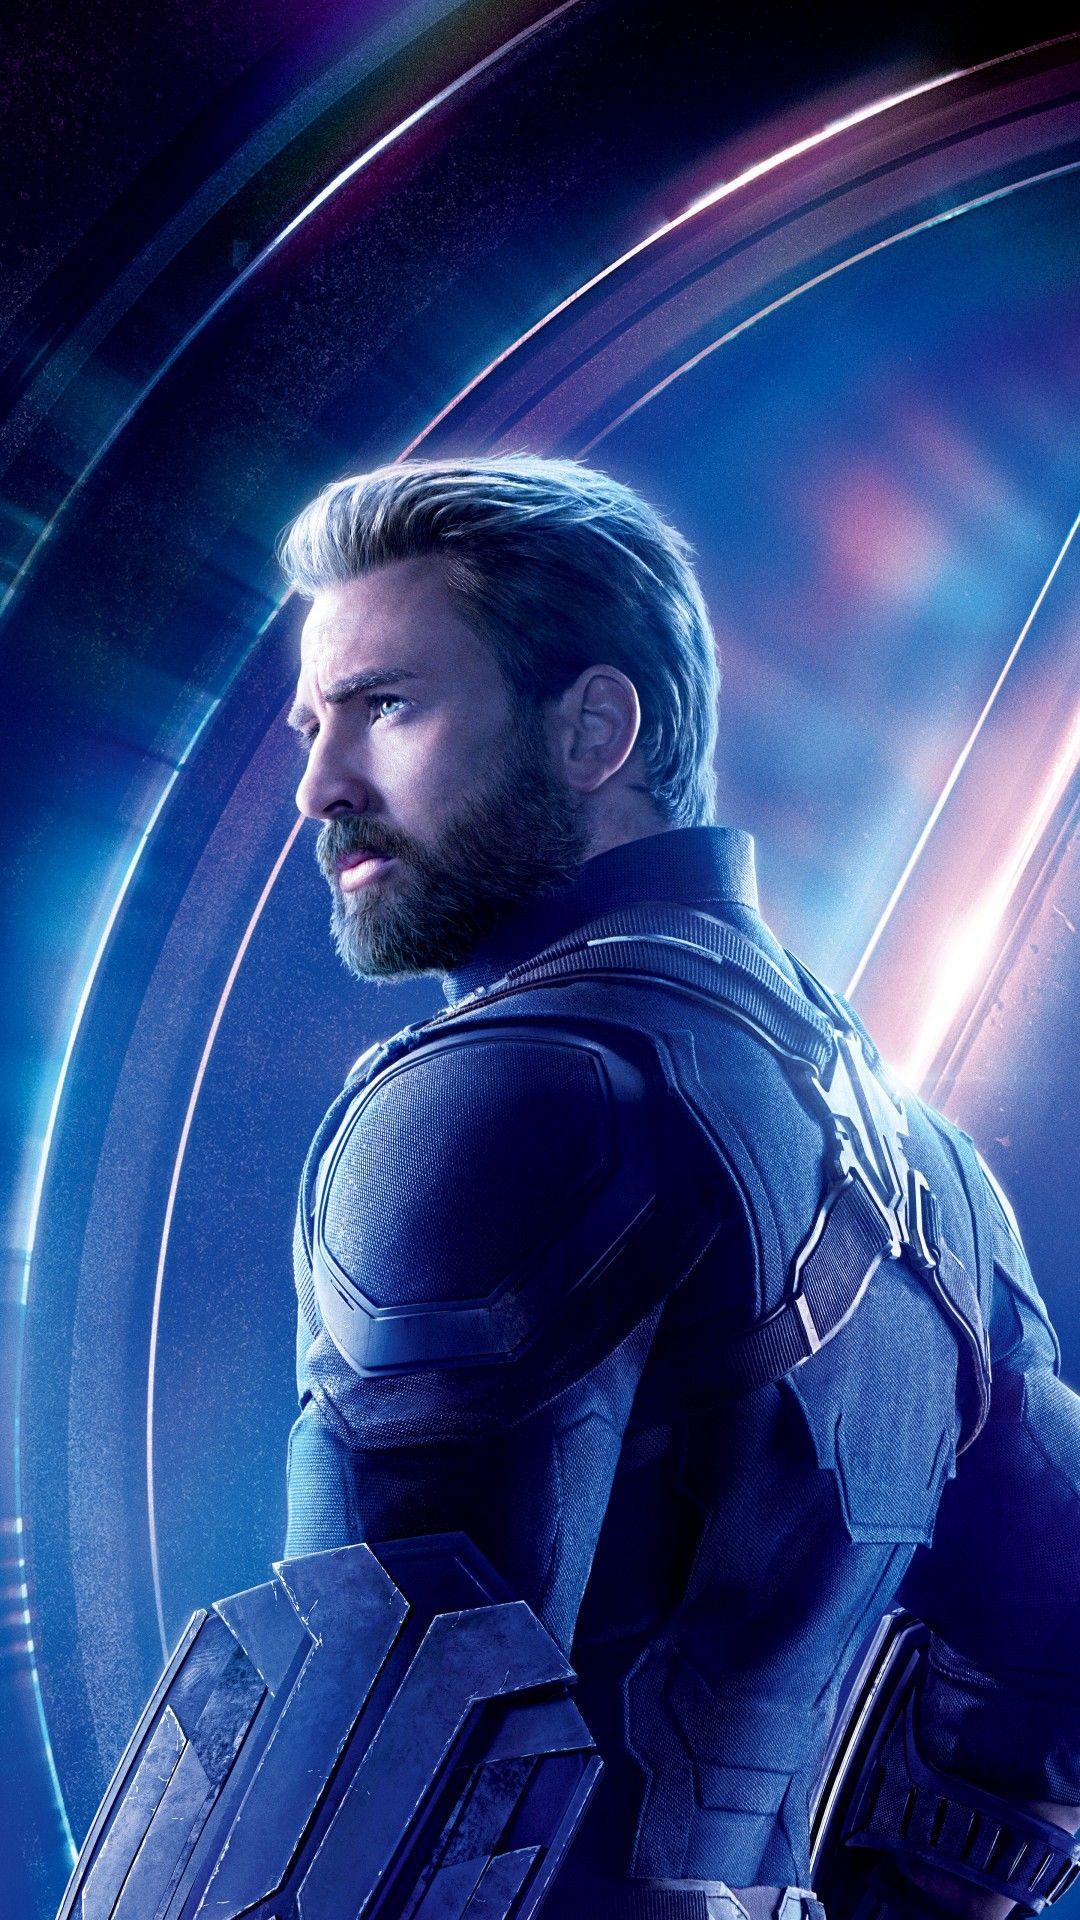 Captain America Infinity War Wallpaper In 2020 Captain America Wallpaper Marvel Captain America Chris Evans Captain America